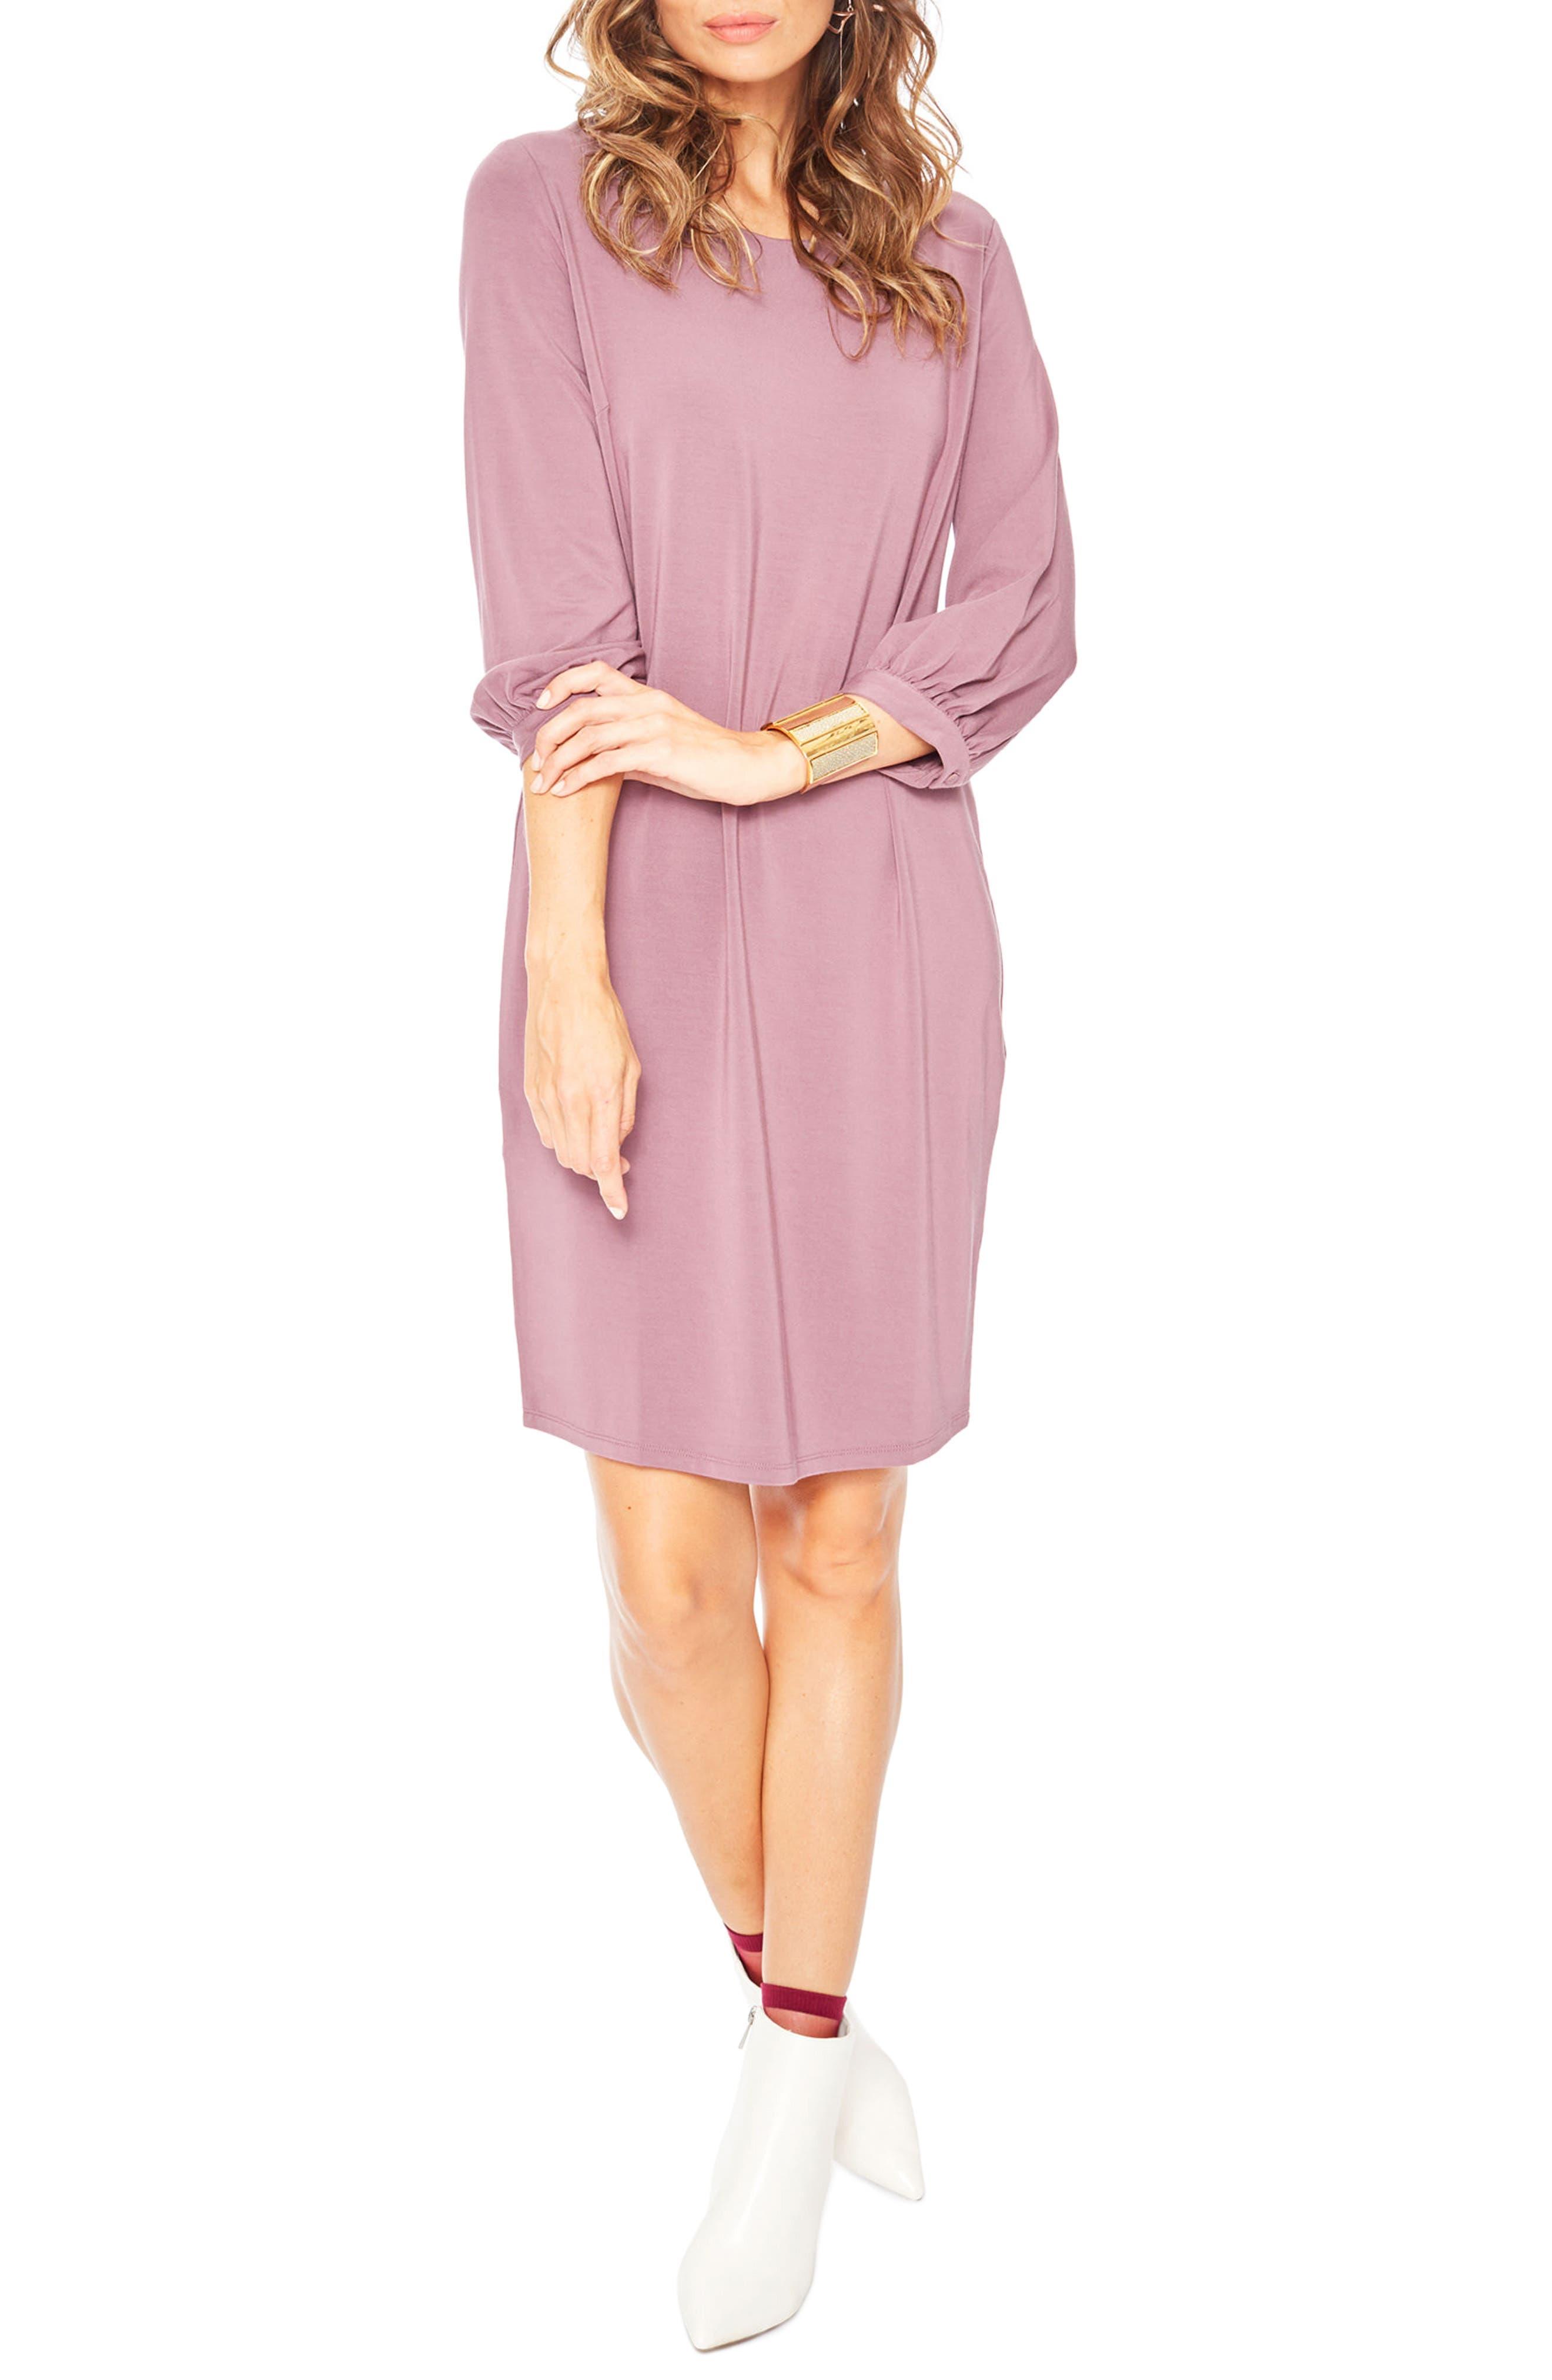 Rosie Pope 'Hampton' Maternity Dress